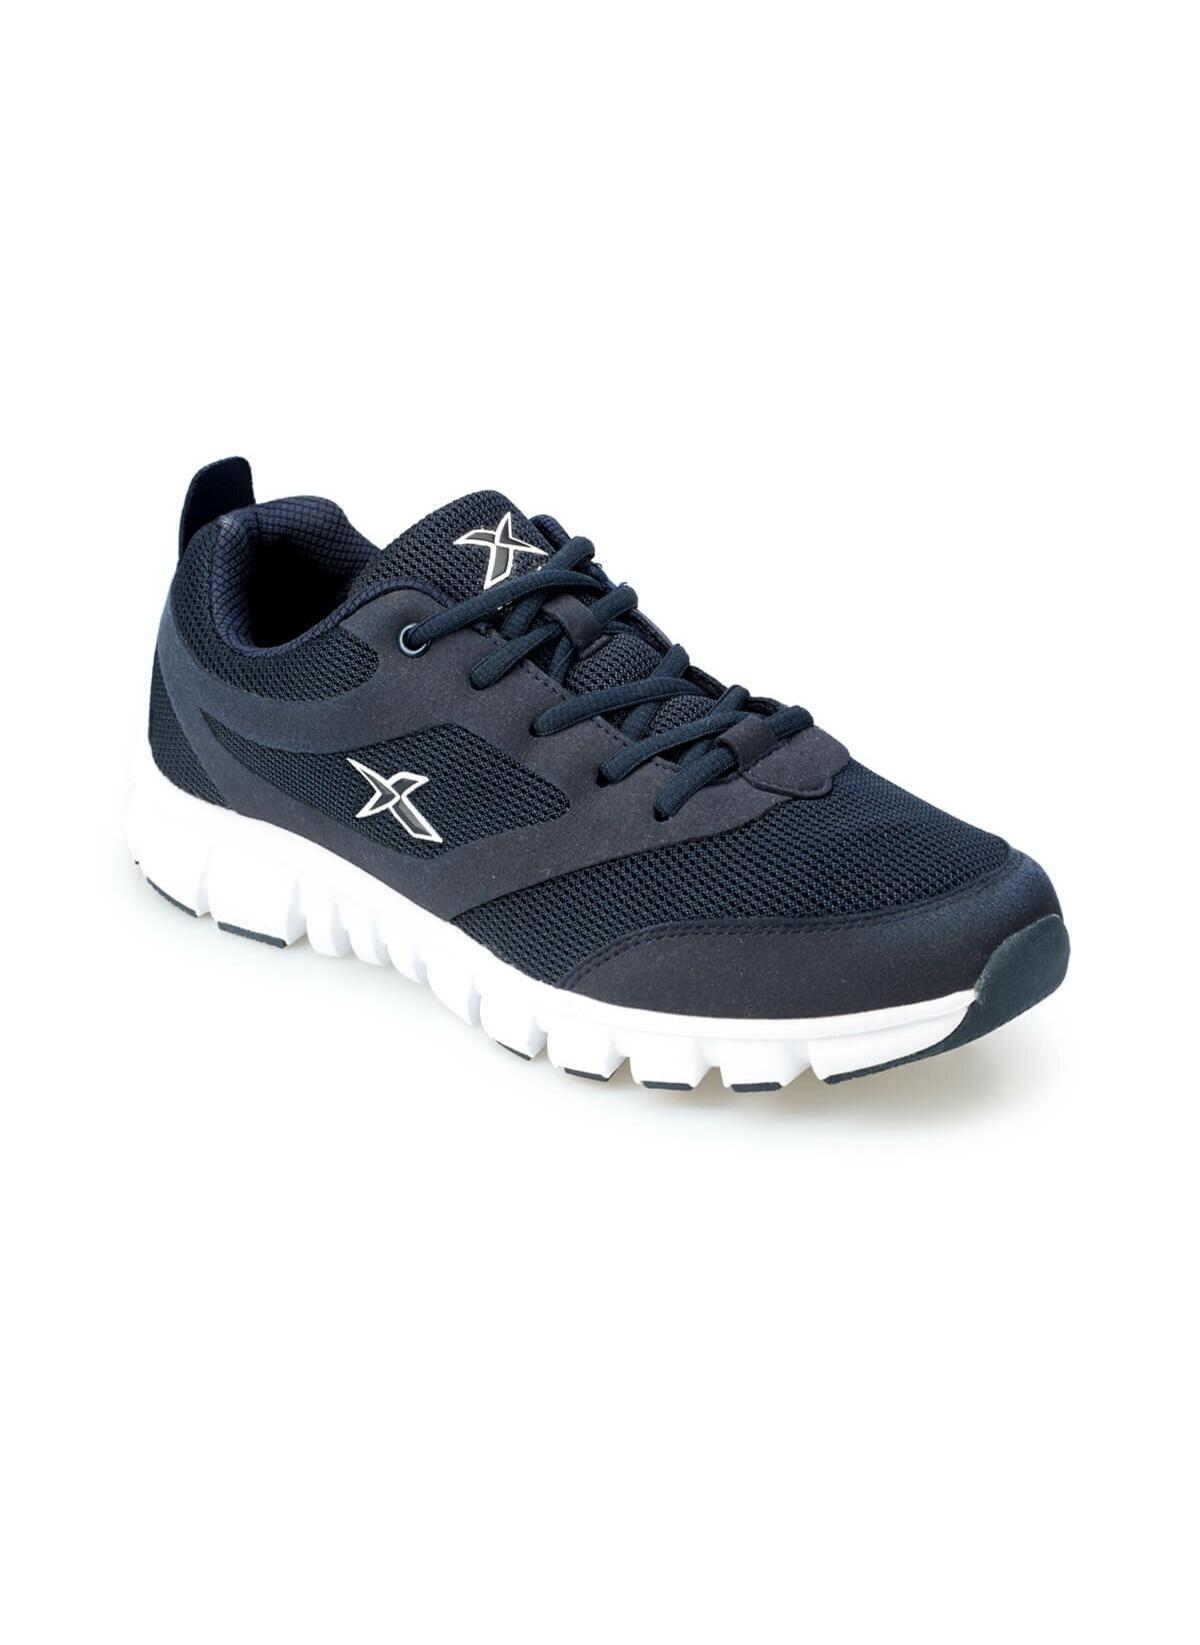 Kinetix Fitness Ayakkabısı Almera Fitness Ayakkabısı – 129.99 TL